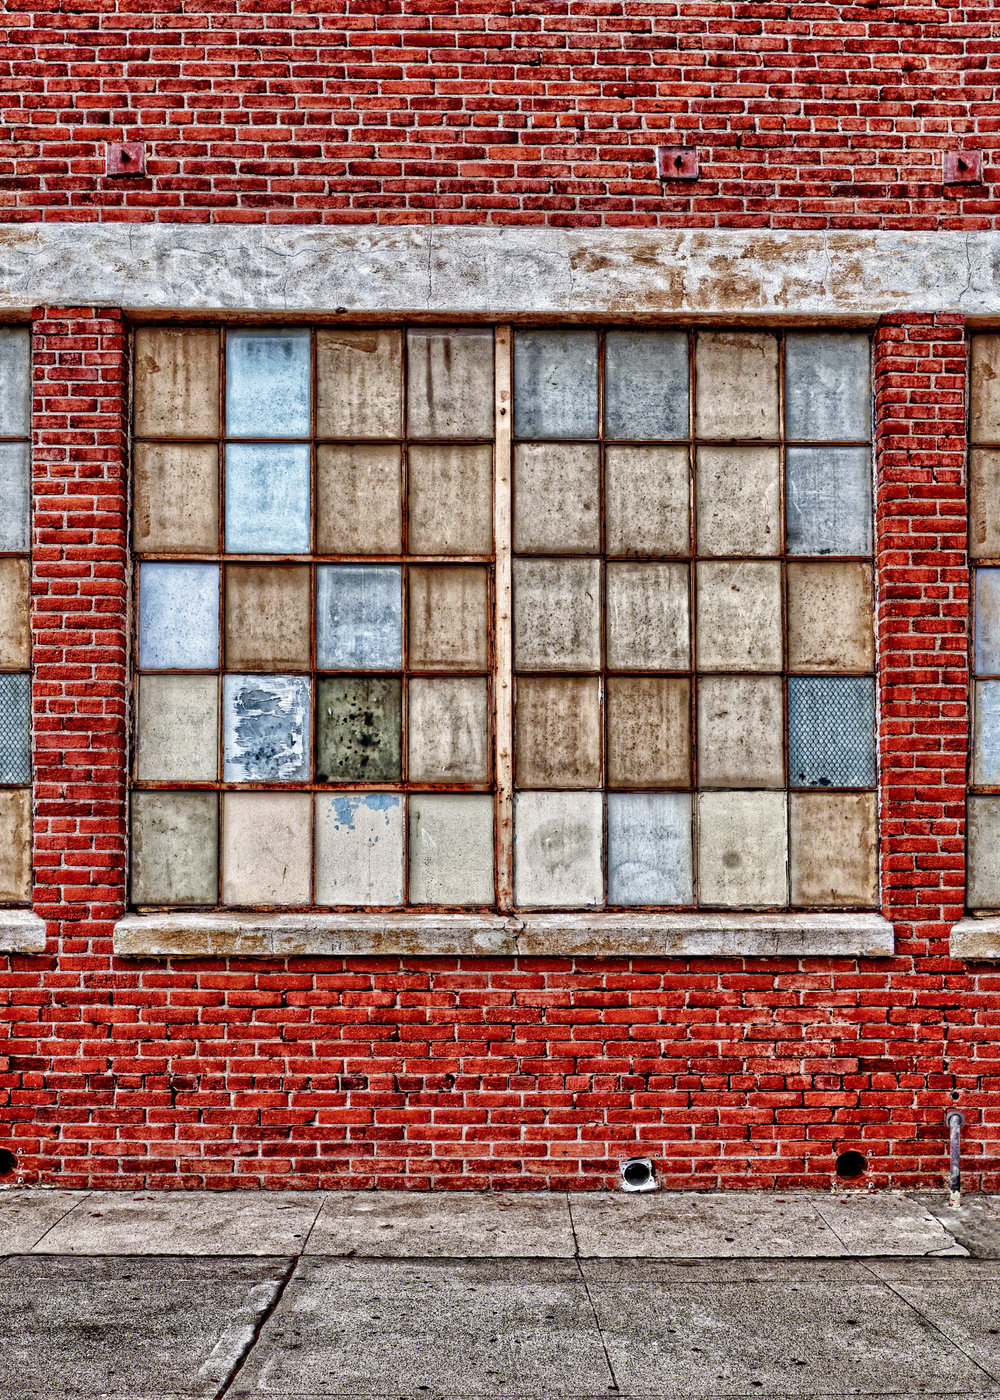 Background F - Grunge Brick Wall